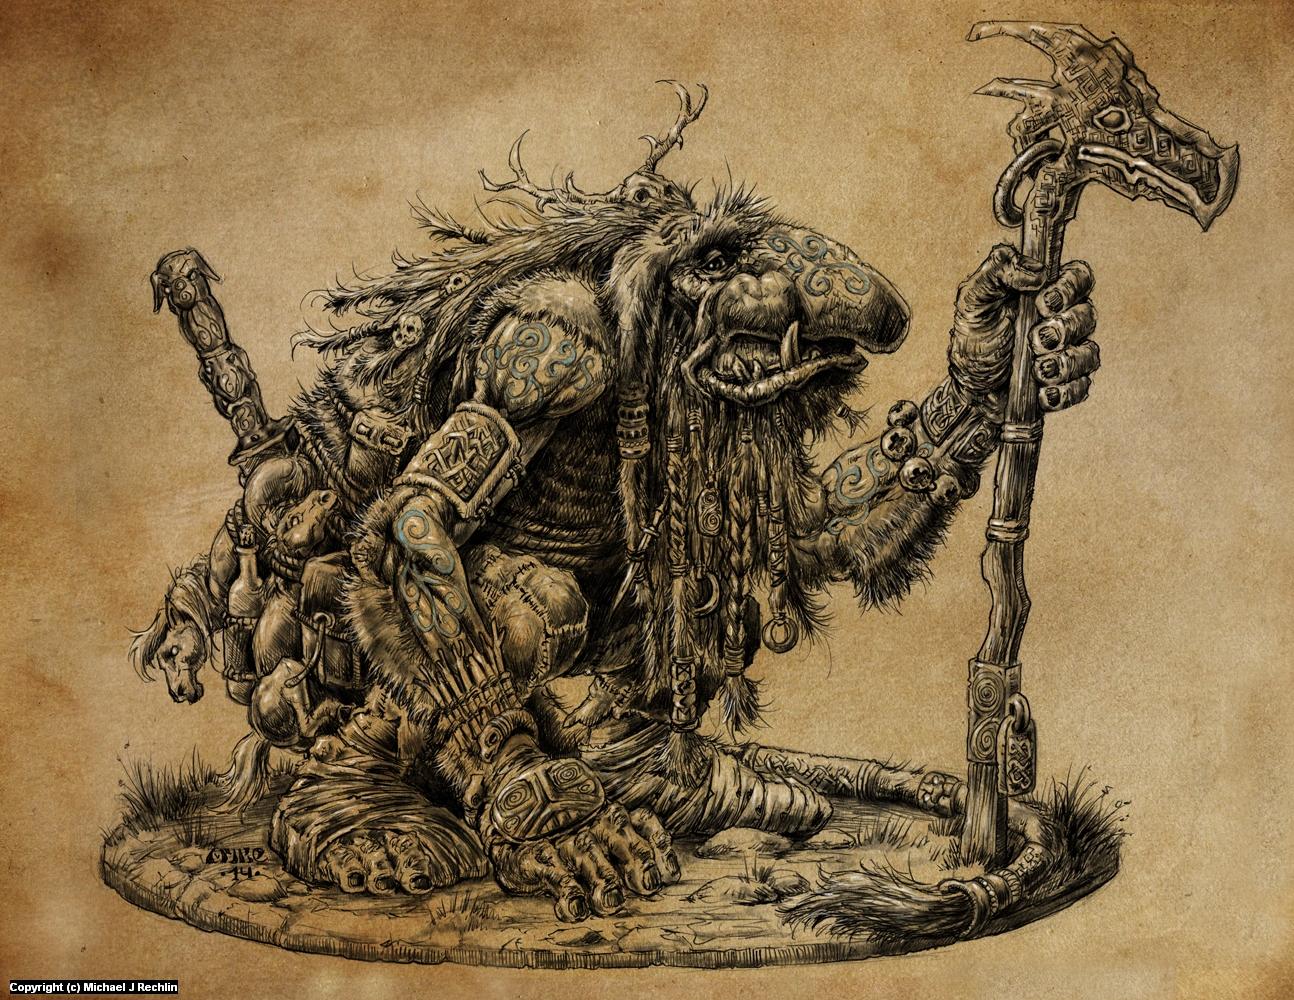 Giant Troll Mystic Artwork by Michael Rechlin